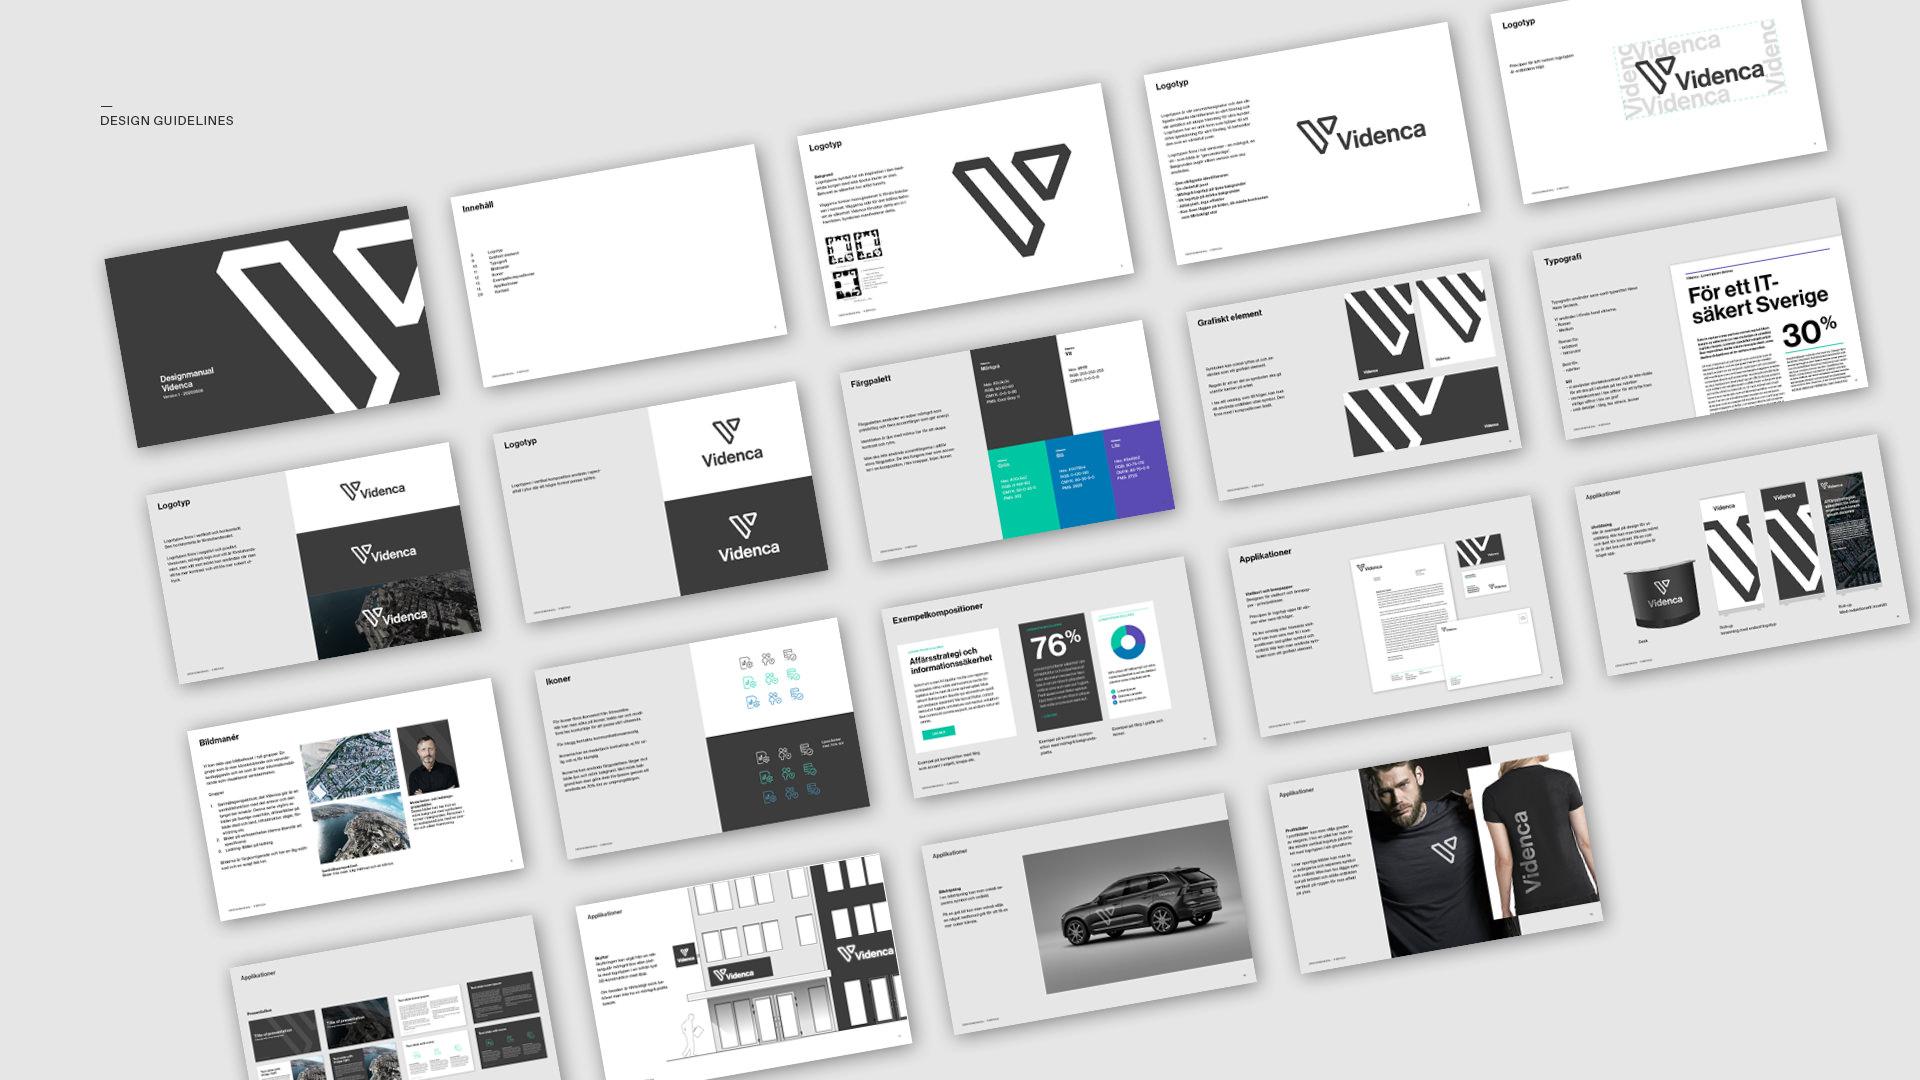 design-guidelines-grafisk-profil-videnca